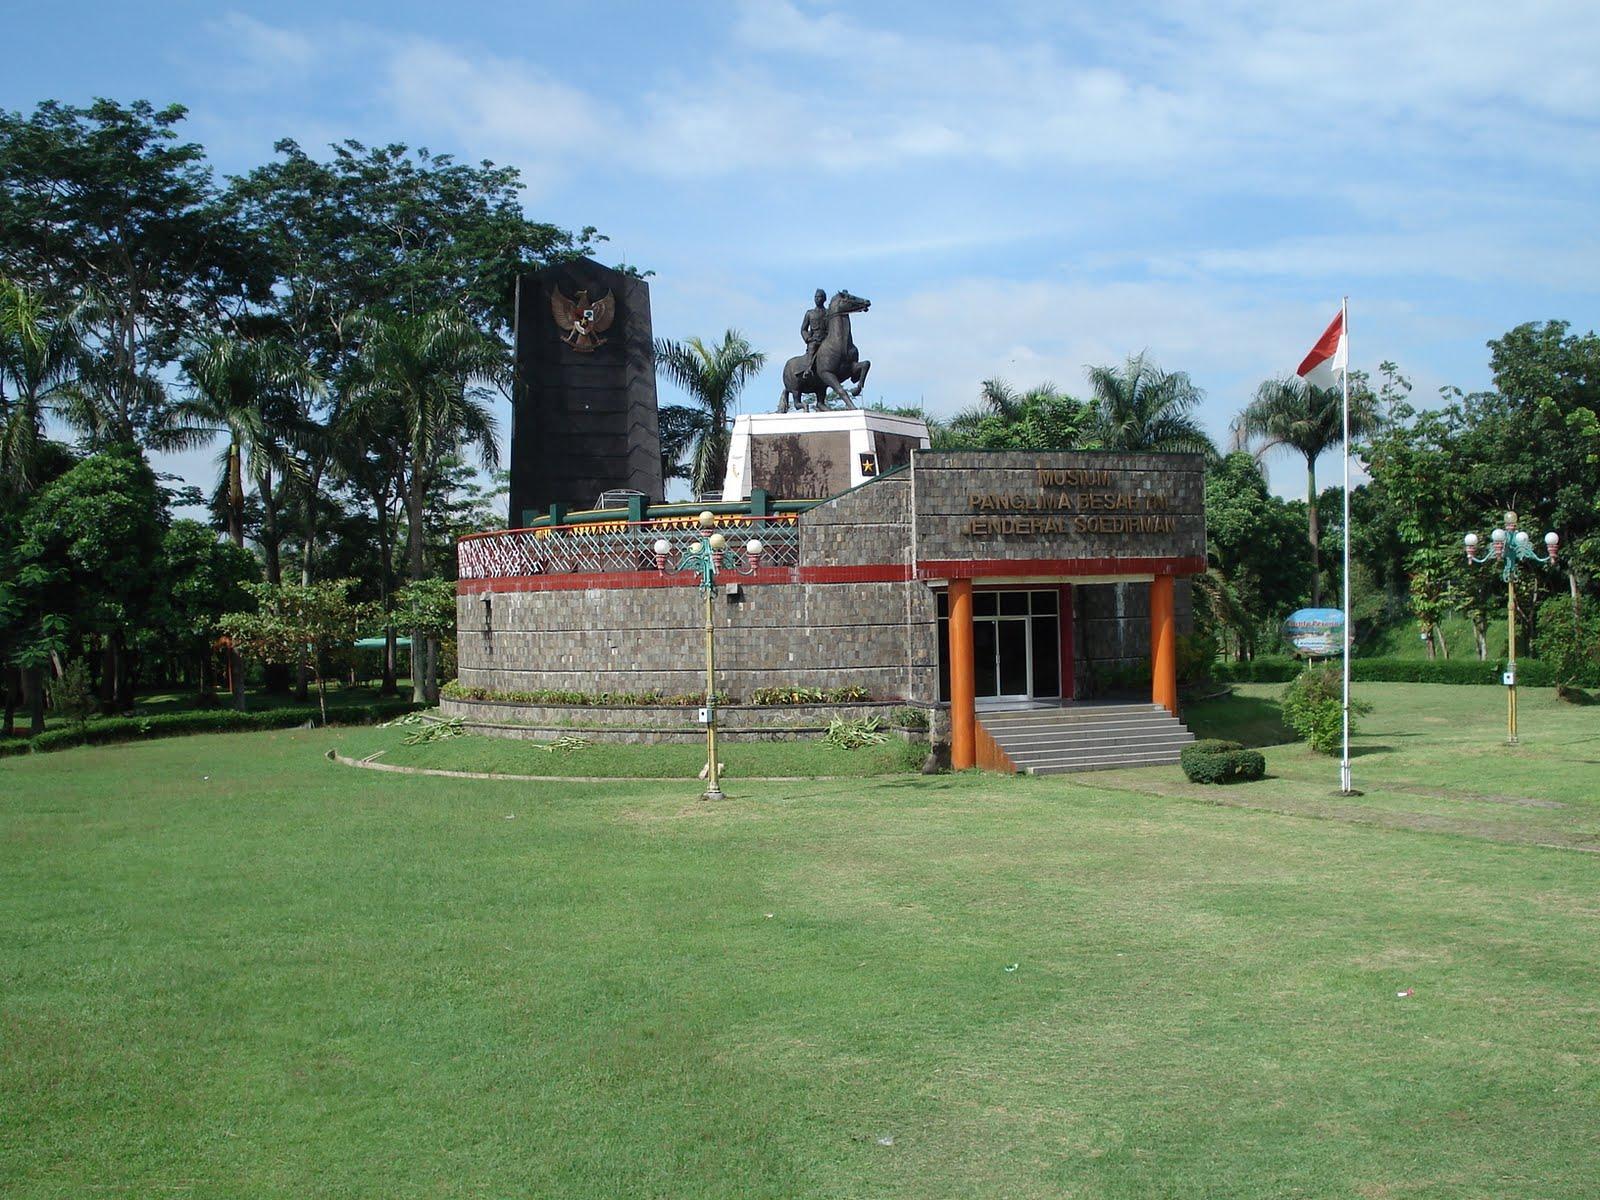 Jalan Museum Meneladani Jenderal Soedirman Diorama Pangsar Sudirman Asri Panglima